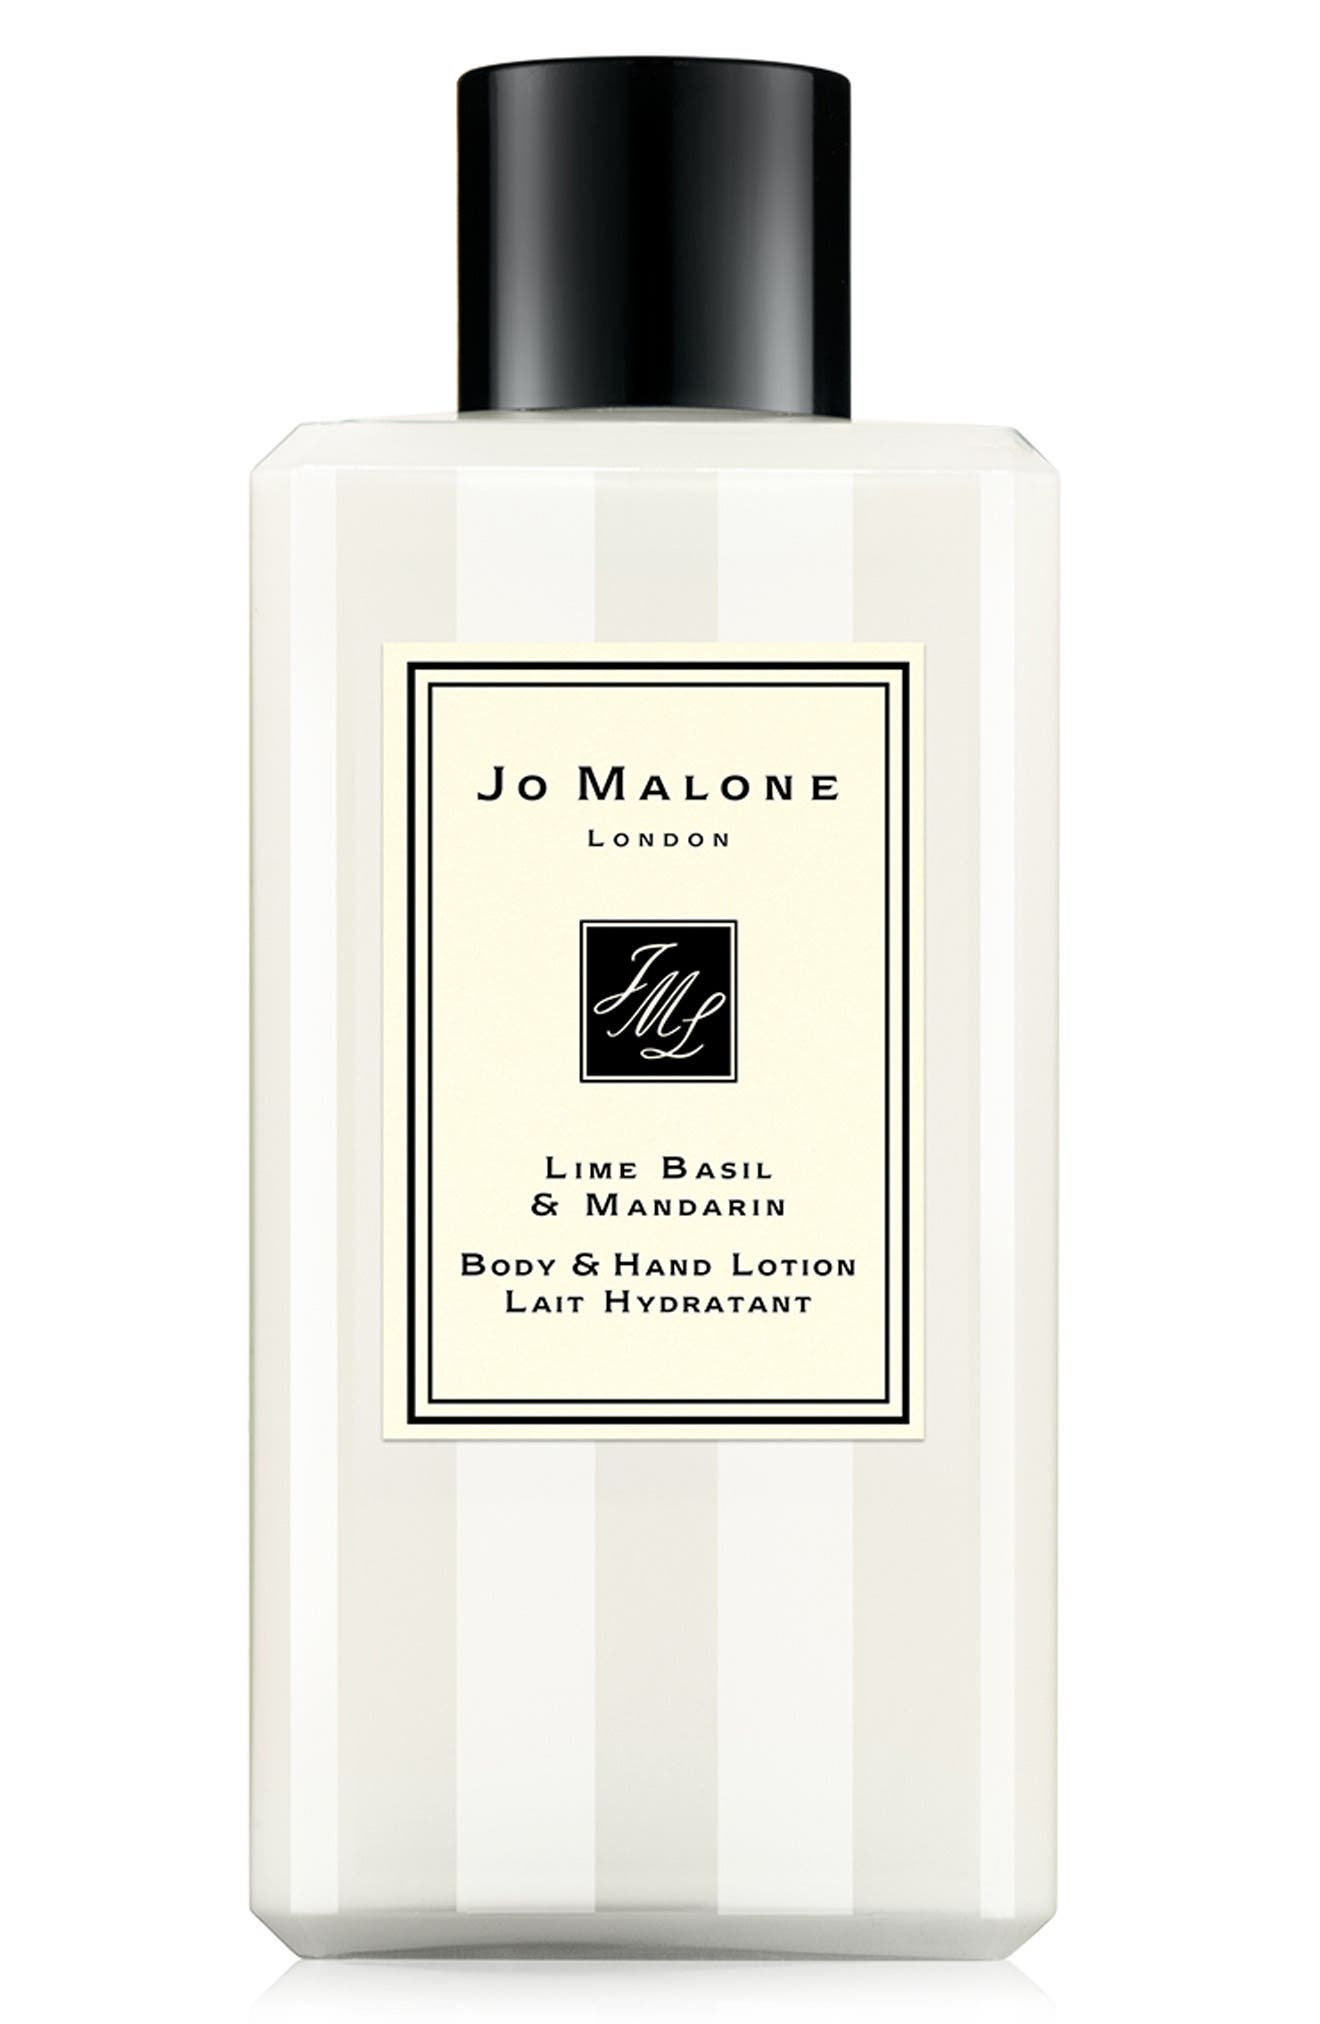 Jo Malone London™ 'Lime Basil & Mandarin' Body Lotion